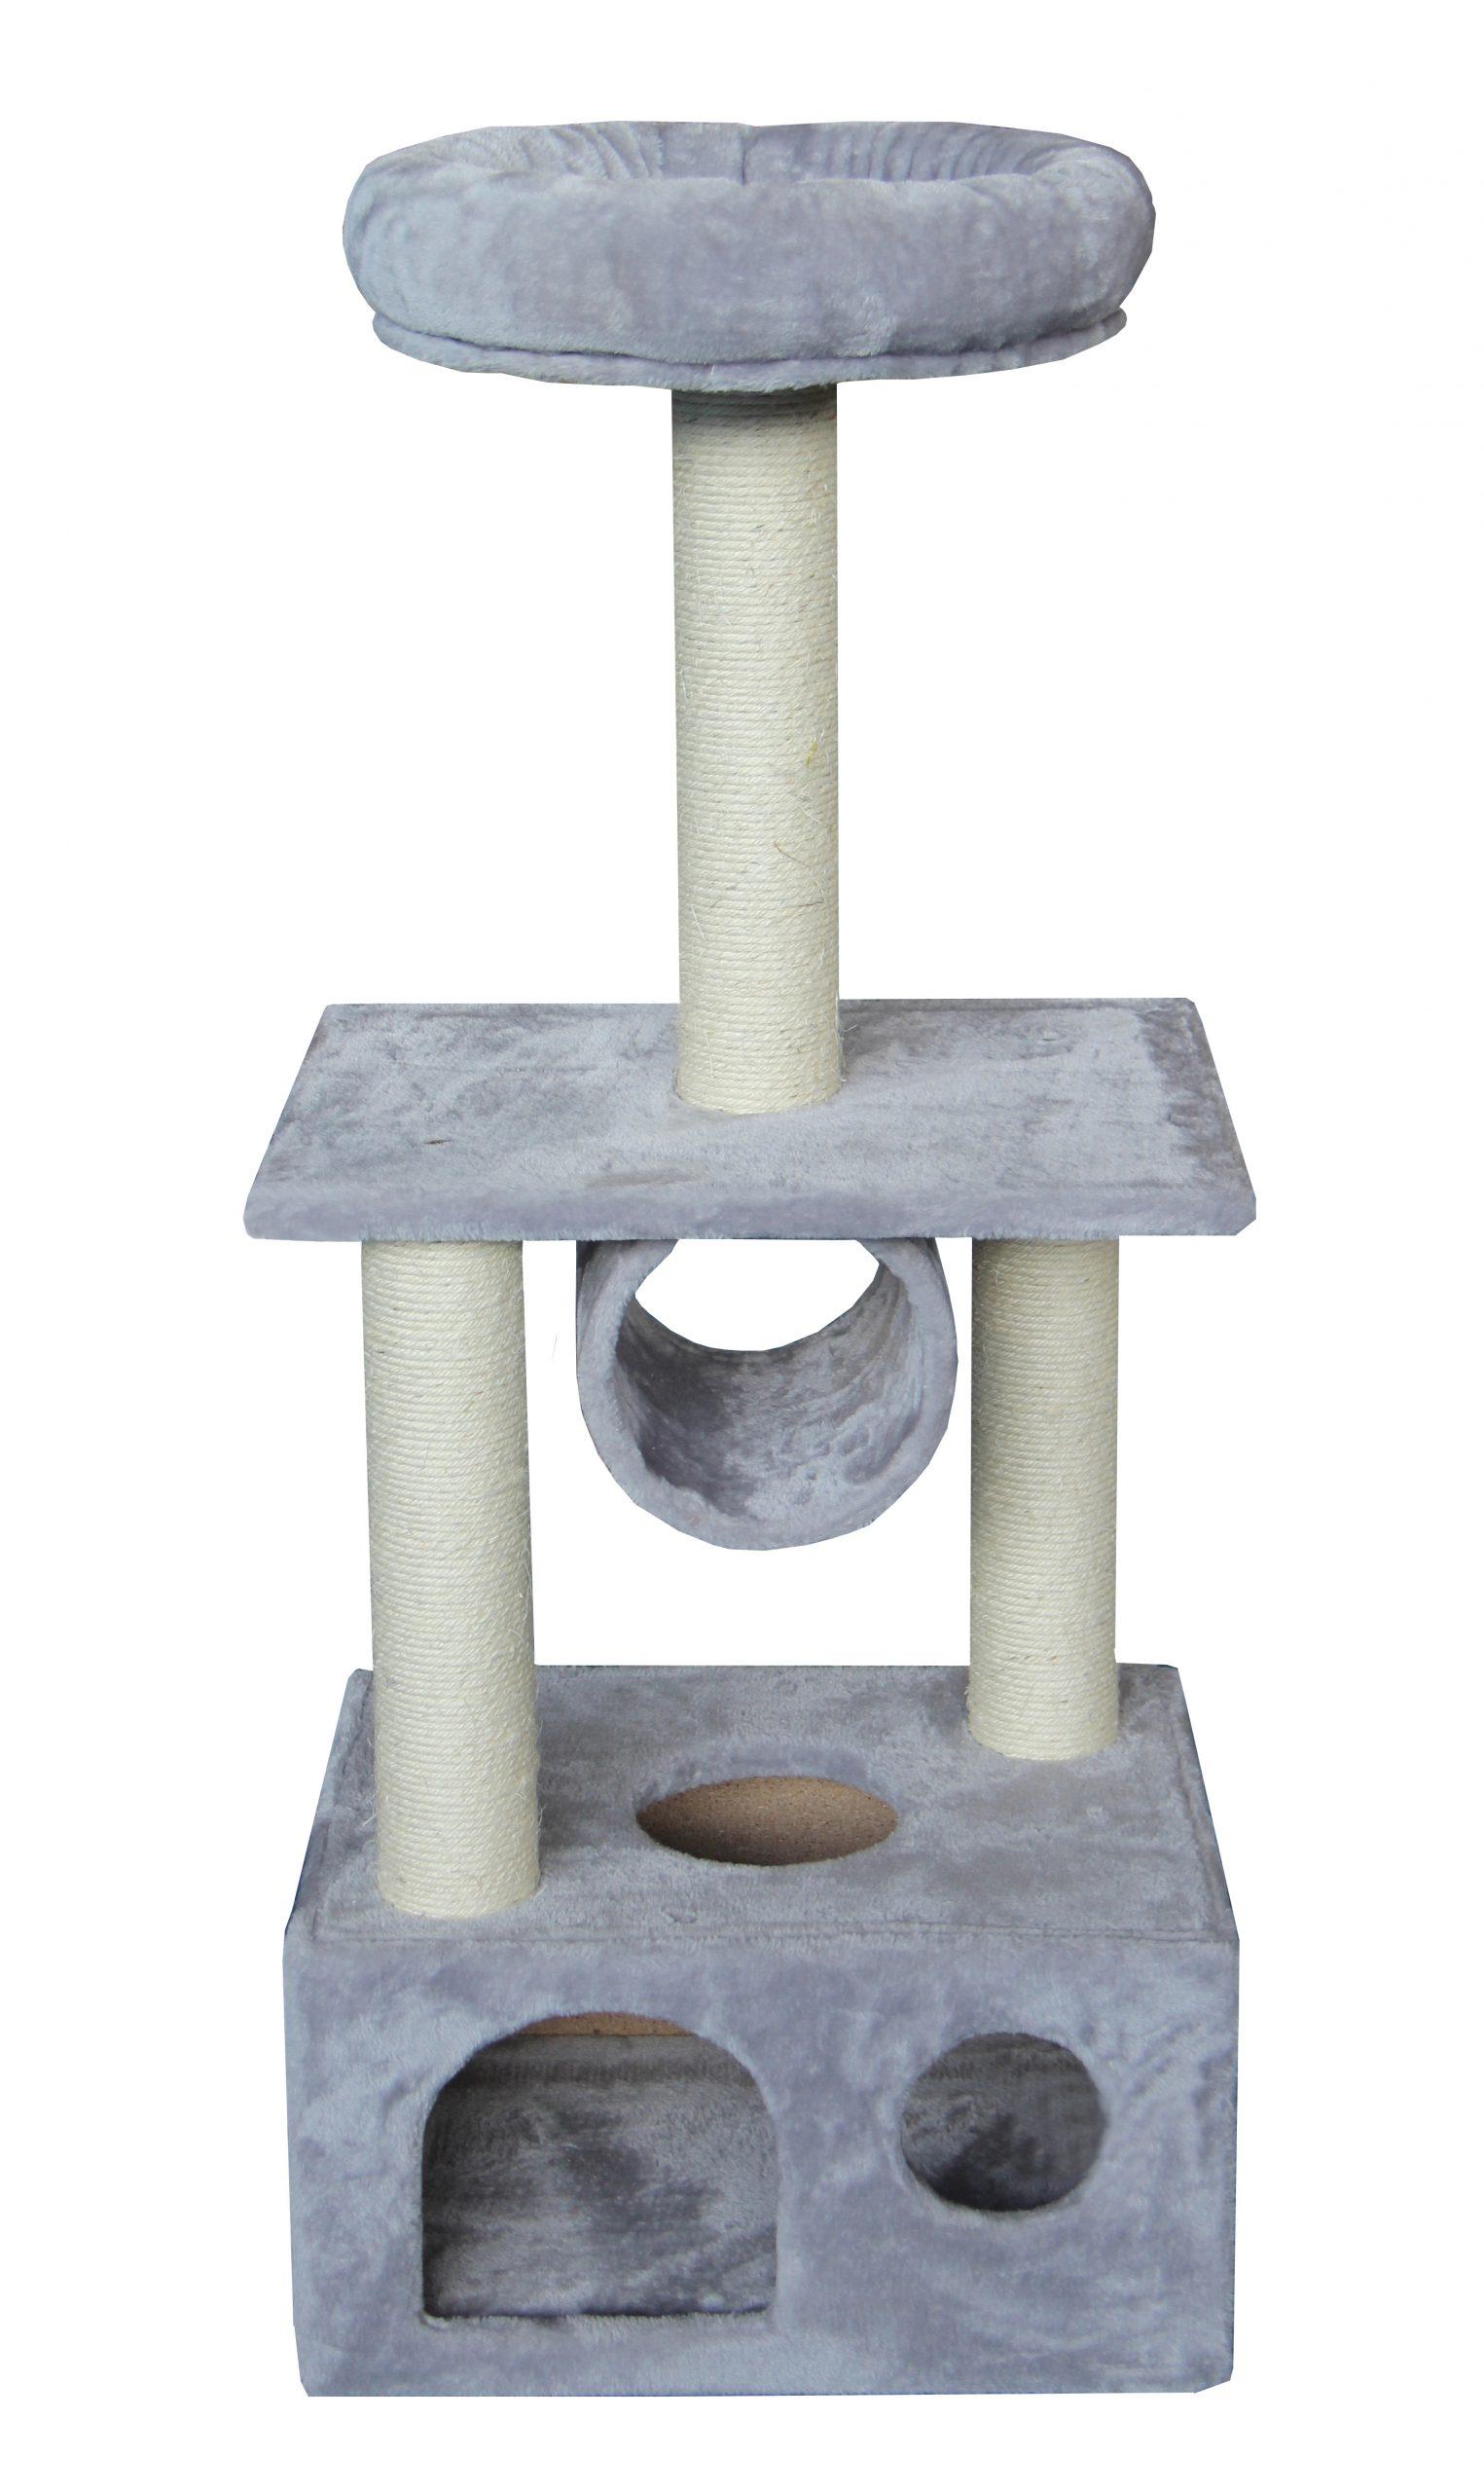 Adori-Krabpaal-Ivy-Krabpaal-50x35x116-cm-Grijs